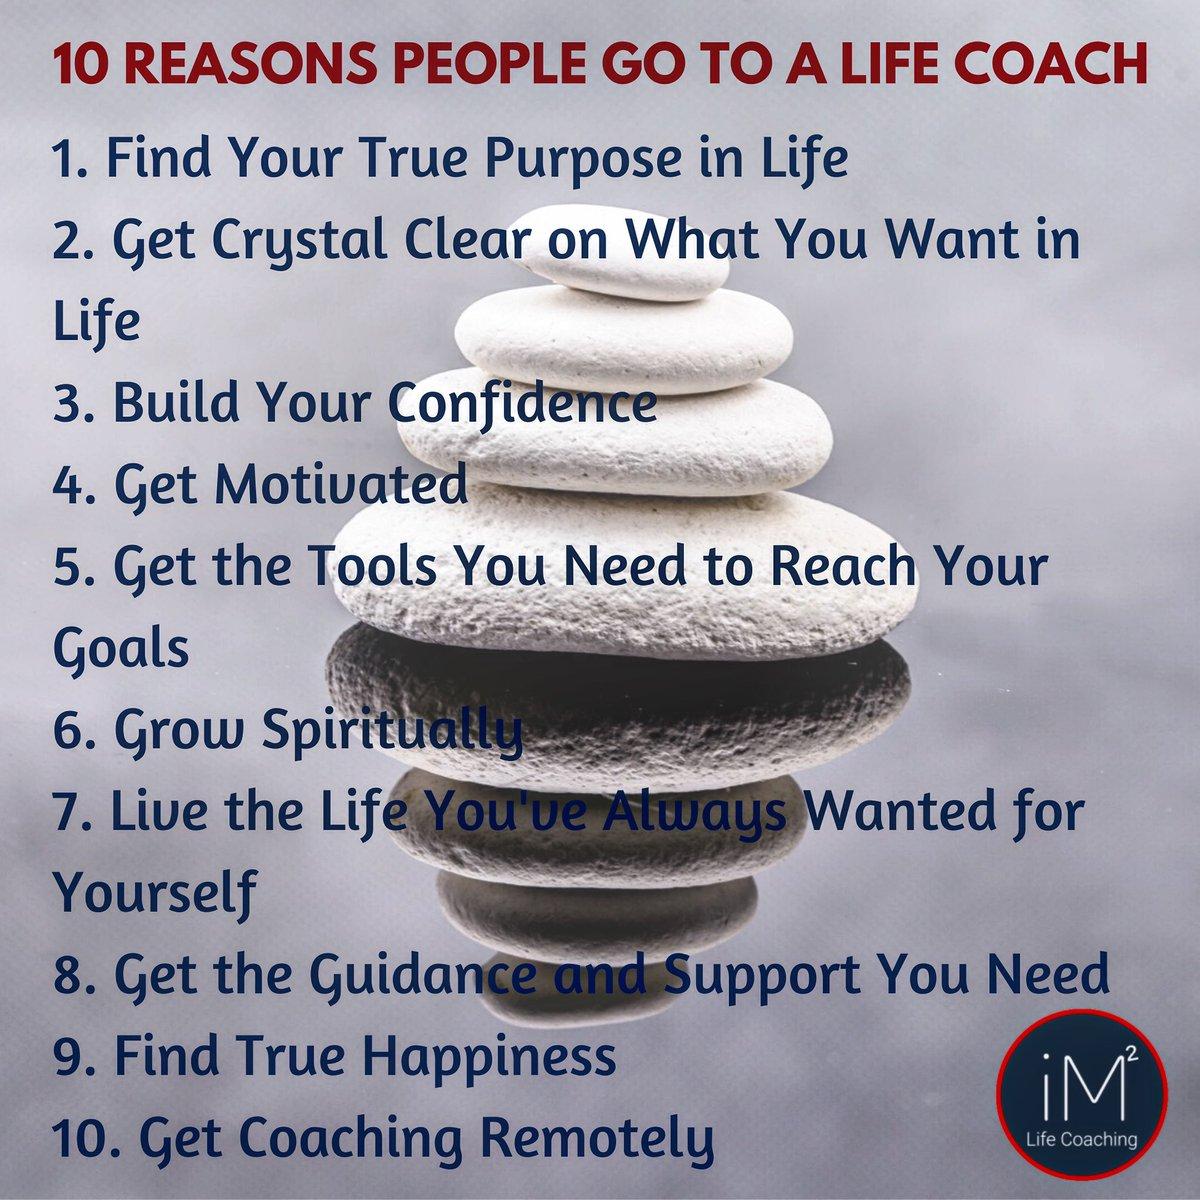 Benefits of having a #lifecoach  #lifecoaching #life #lifecoachingtips #lifecoaches  #goals #strategy #selfdevelopment #selfcare #self #selfworth #selfmade #selfawareness #lifecoachinghappiness #coachlife #imsquaredlifecoaching #selflove #purpose #goalspic.twitter.com/yBAzRjOE9G